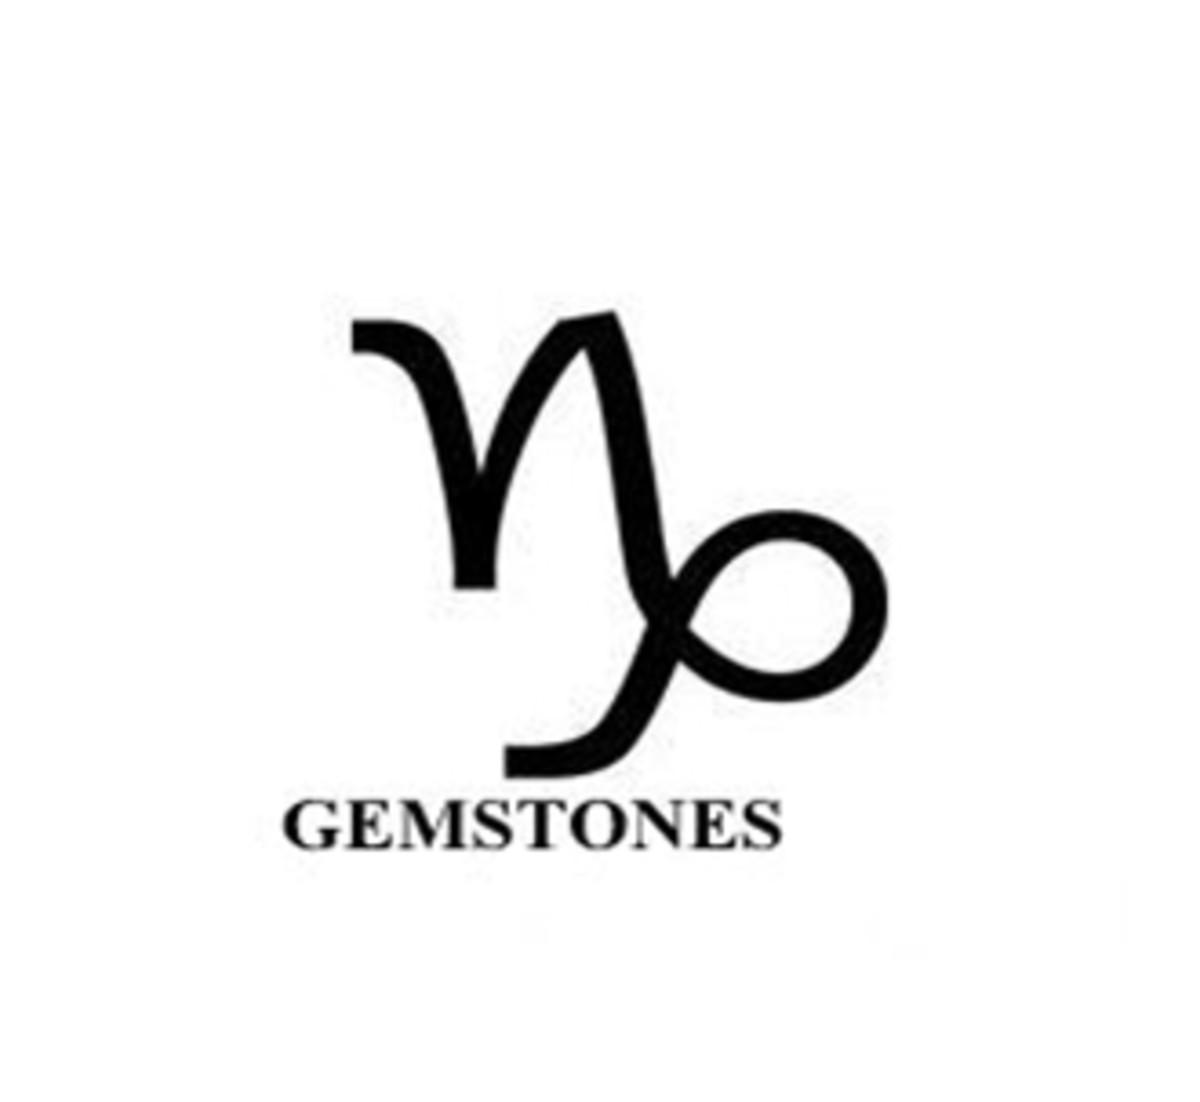 Capricorn Zodiac Sign Gemstones